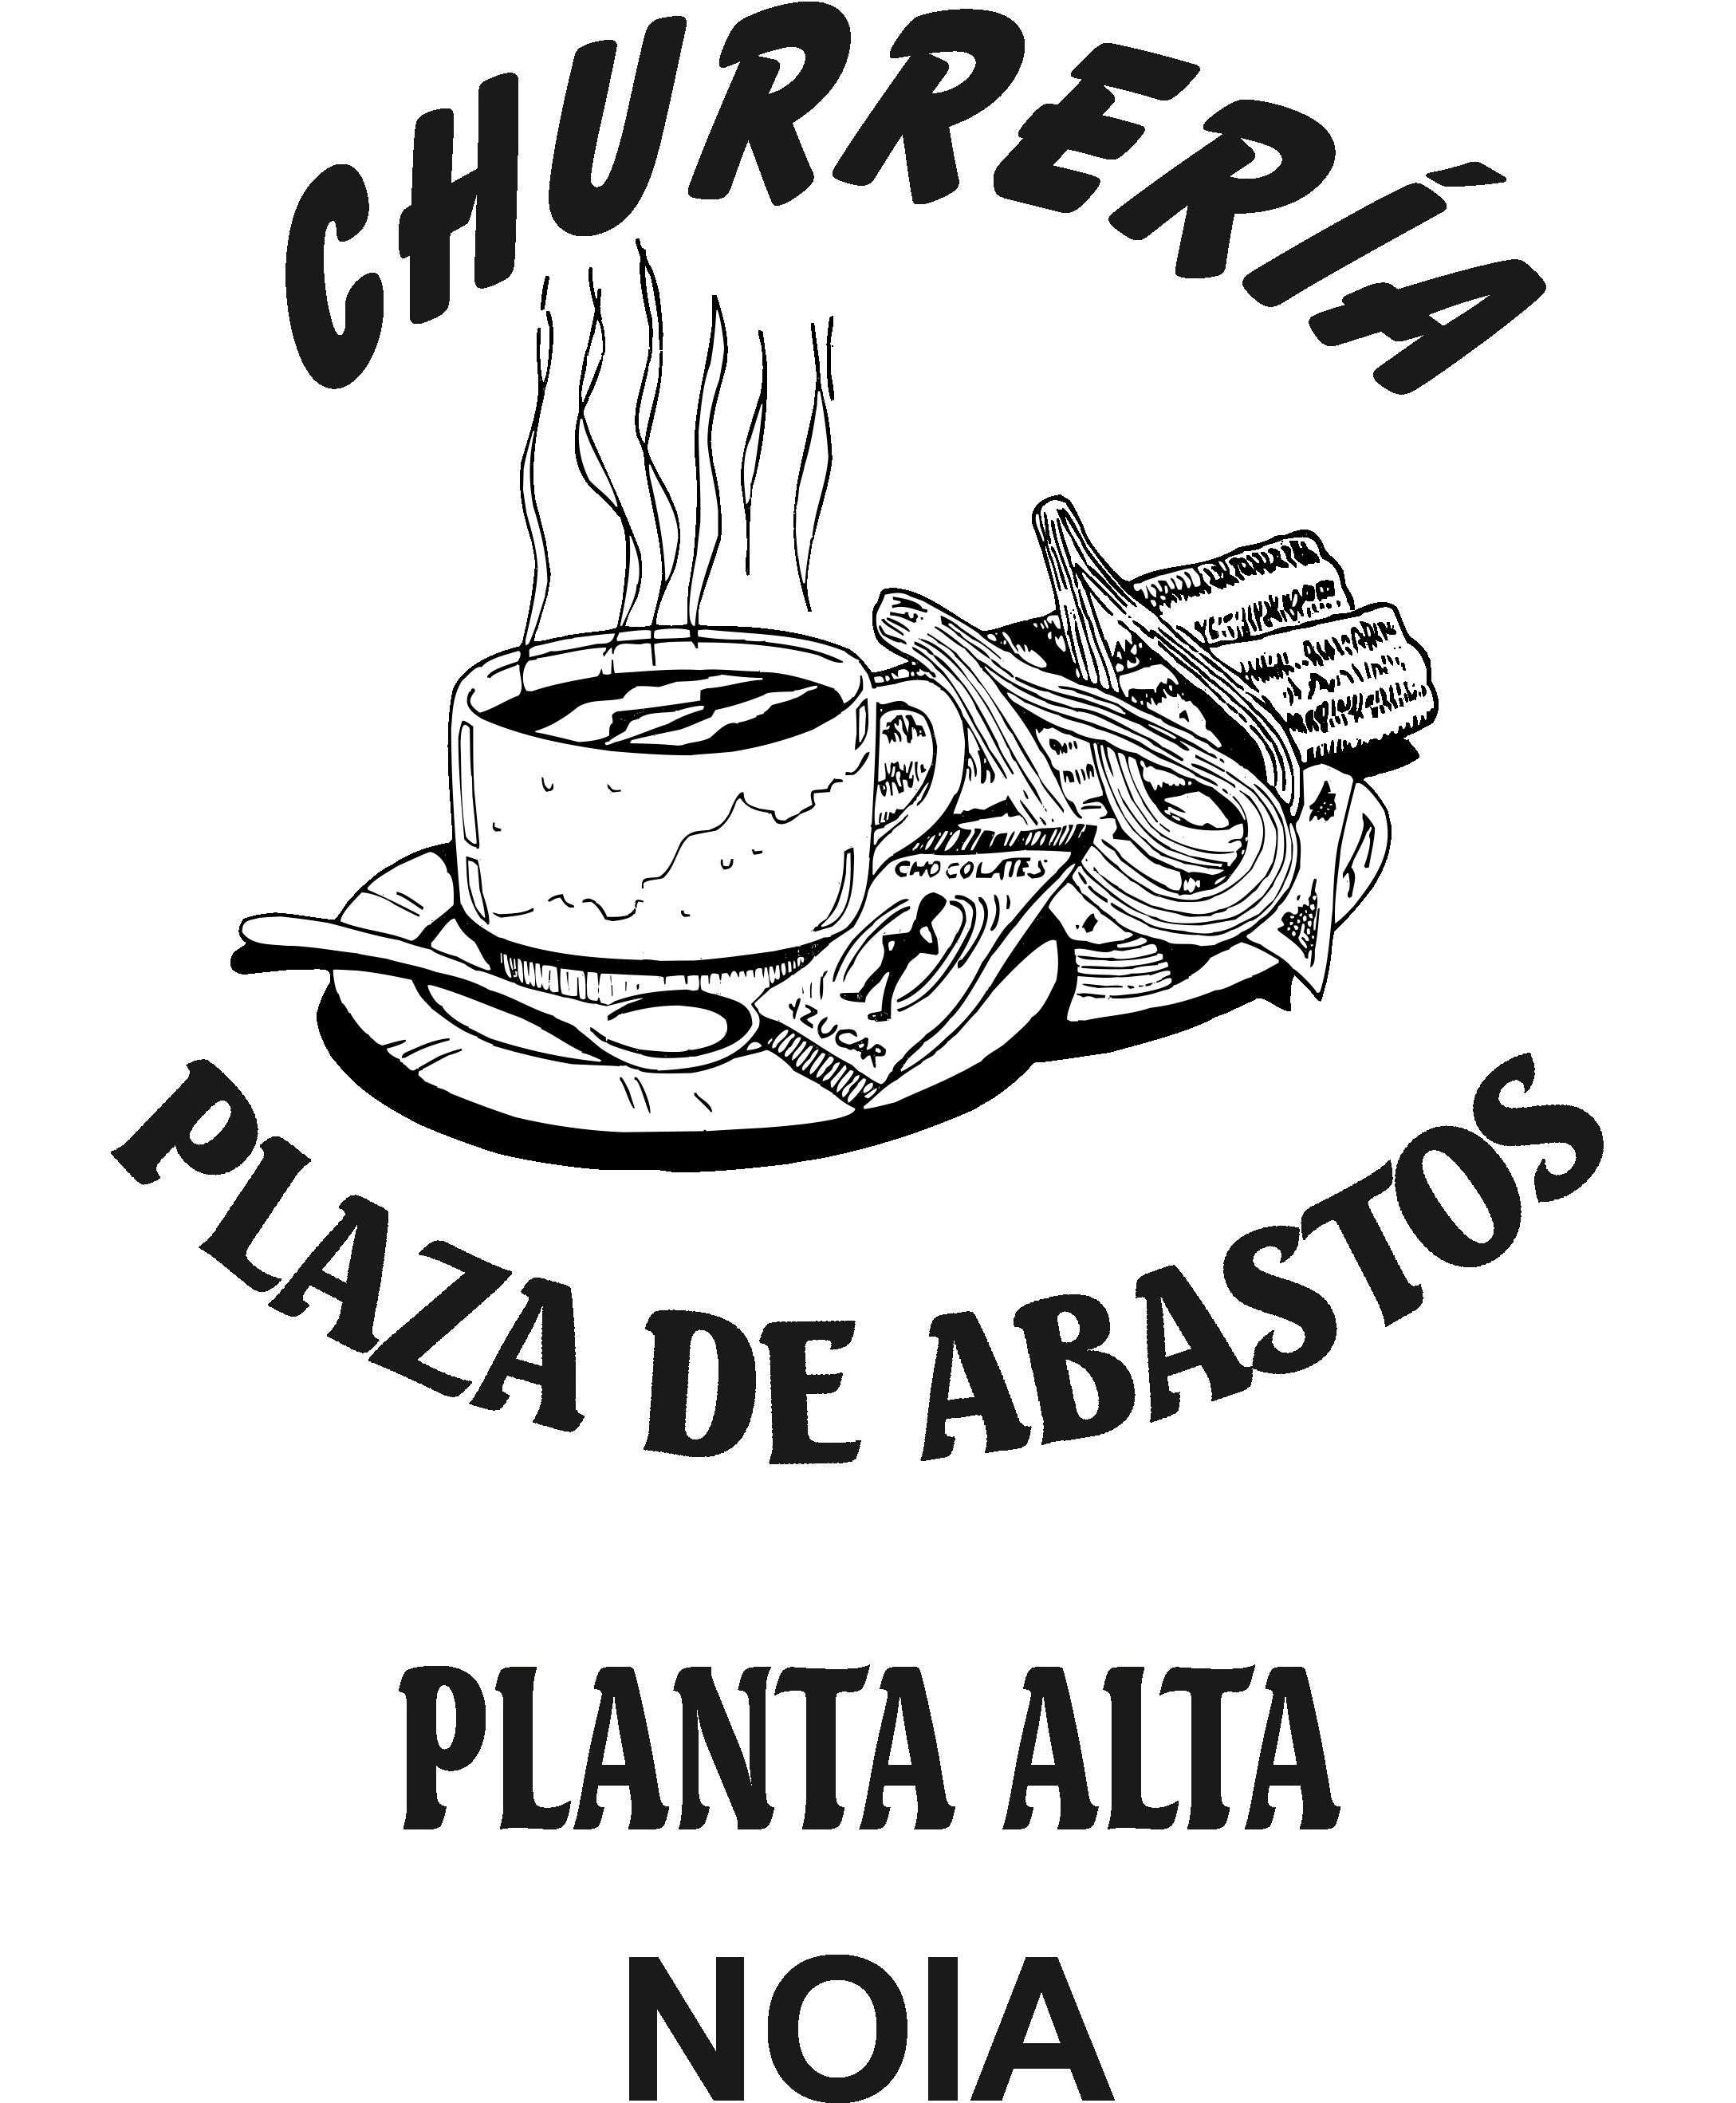 2017-publi-churreriaplaza